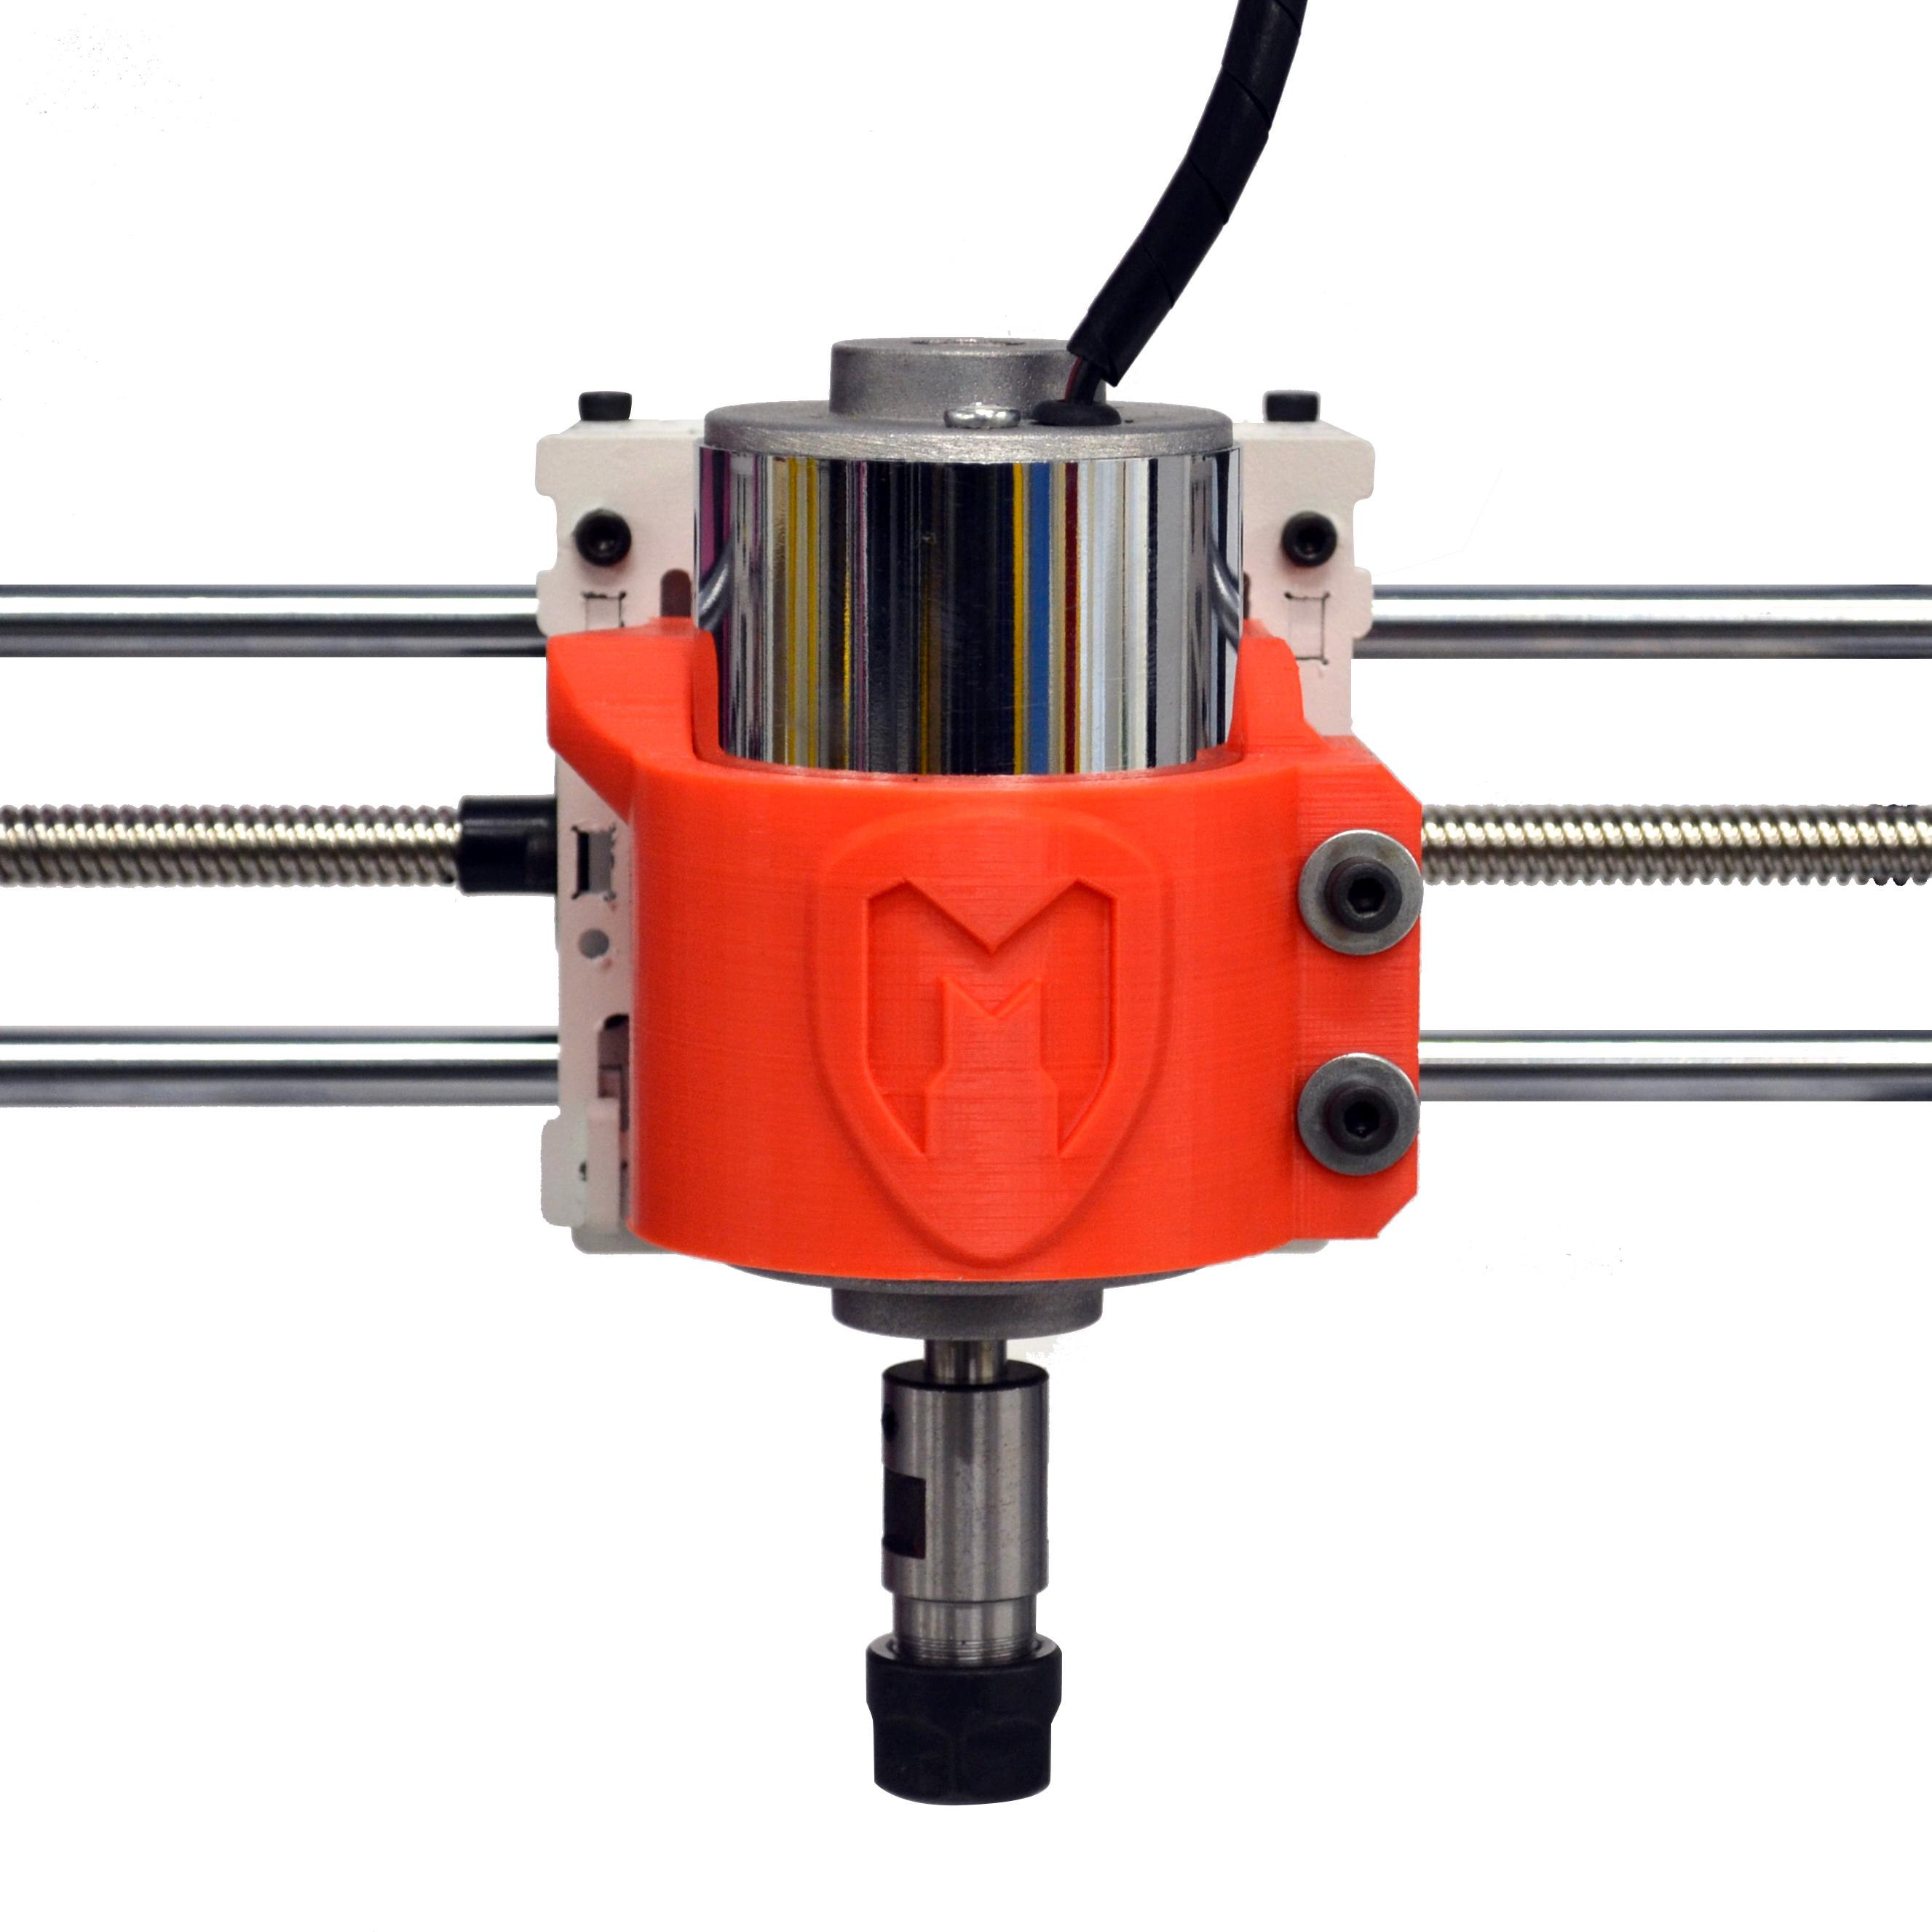 30991.jpg Download free STL file Prusa I3 Steel V2 Makerparts - Laser Cut • Template to 3D print, Agos3D